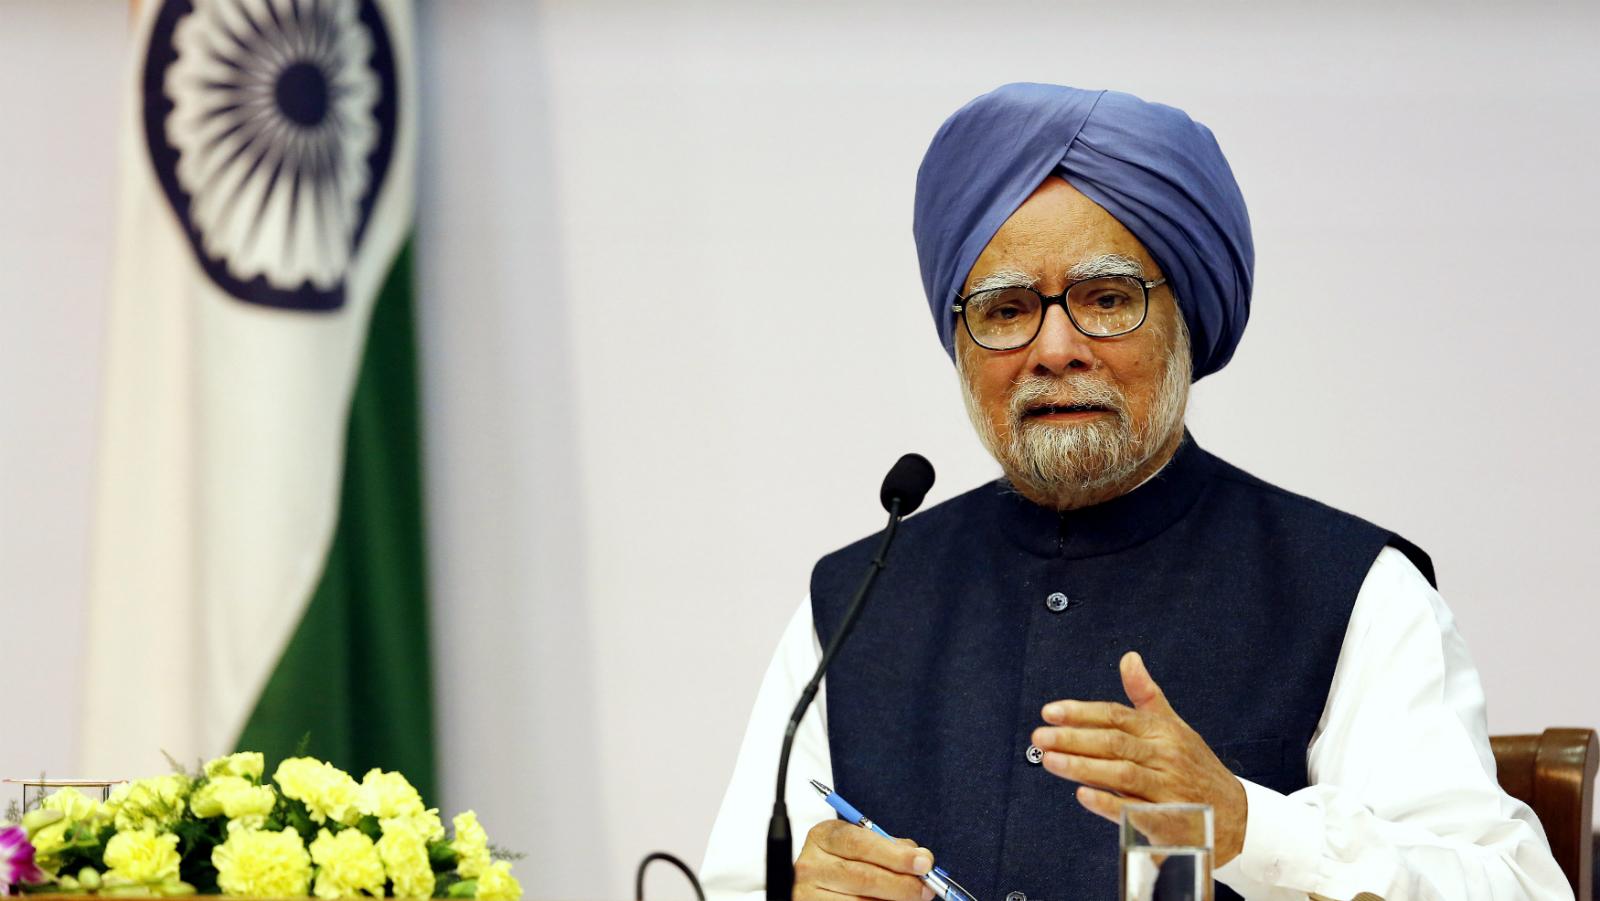 Former Indian prime minister Manmohan Singh in New Delhi in January 2014.